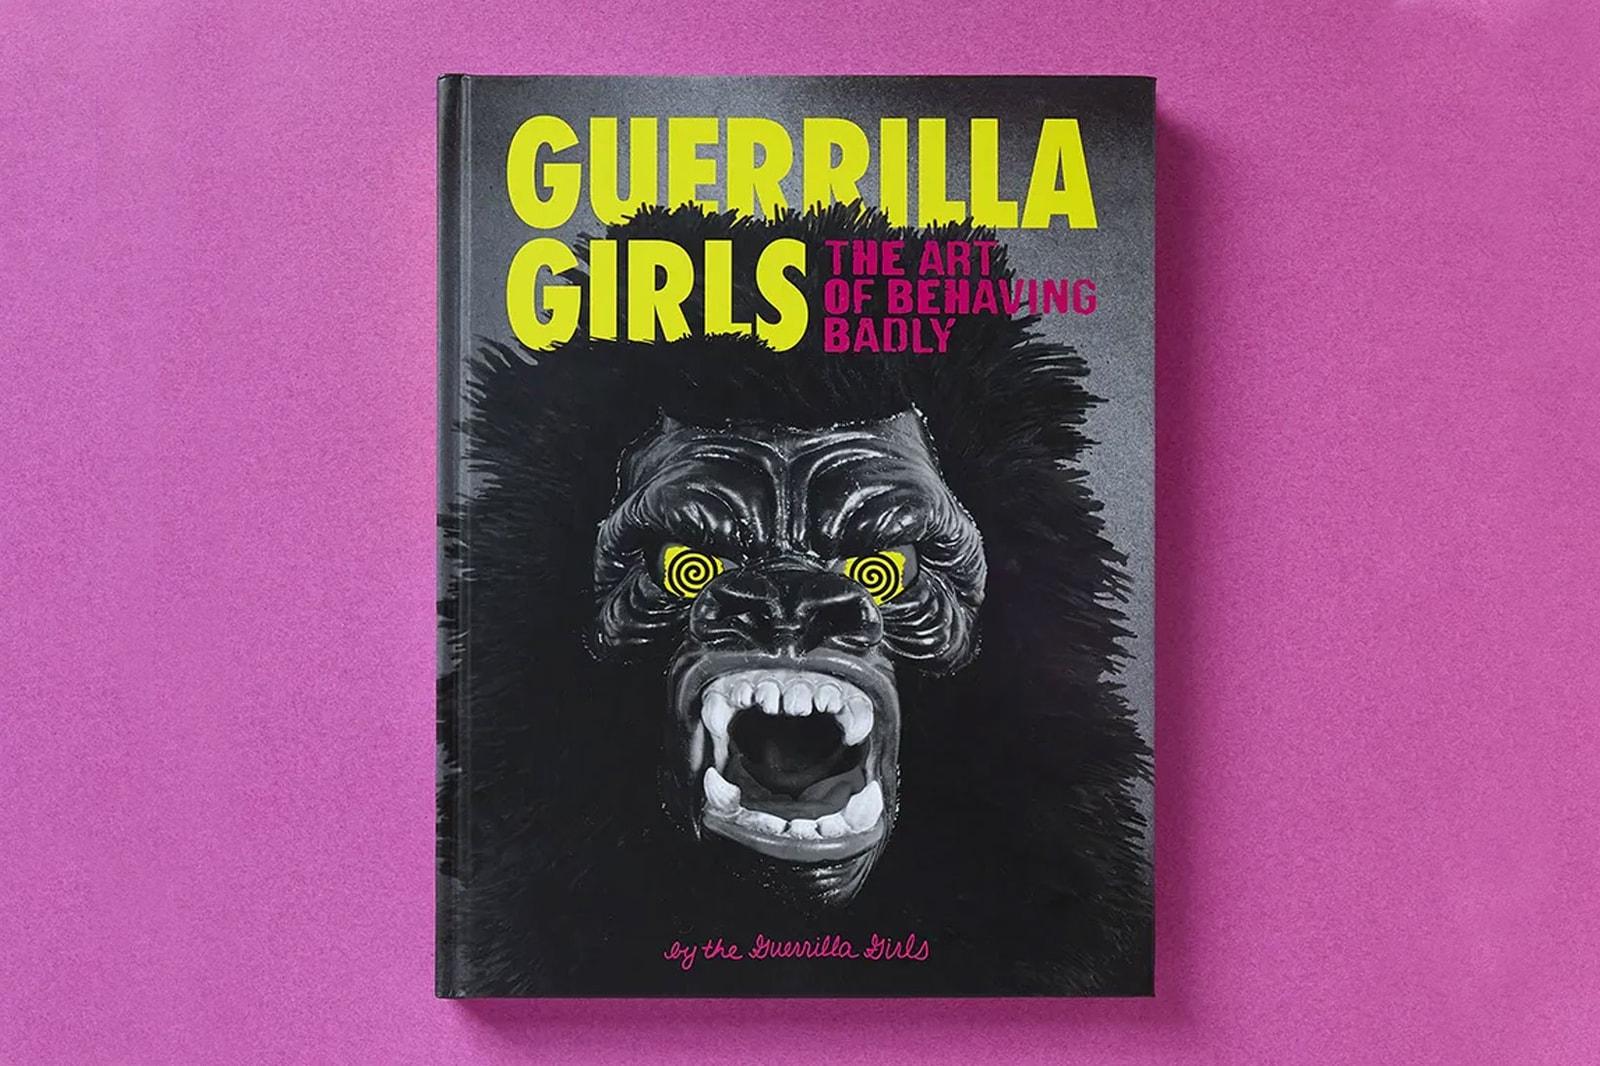 the guerrilla girls art of behaving badly retrospective book release interview art feminism activism